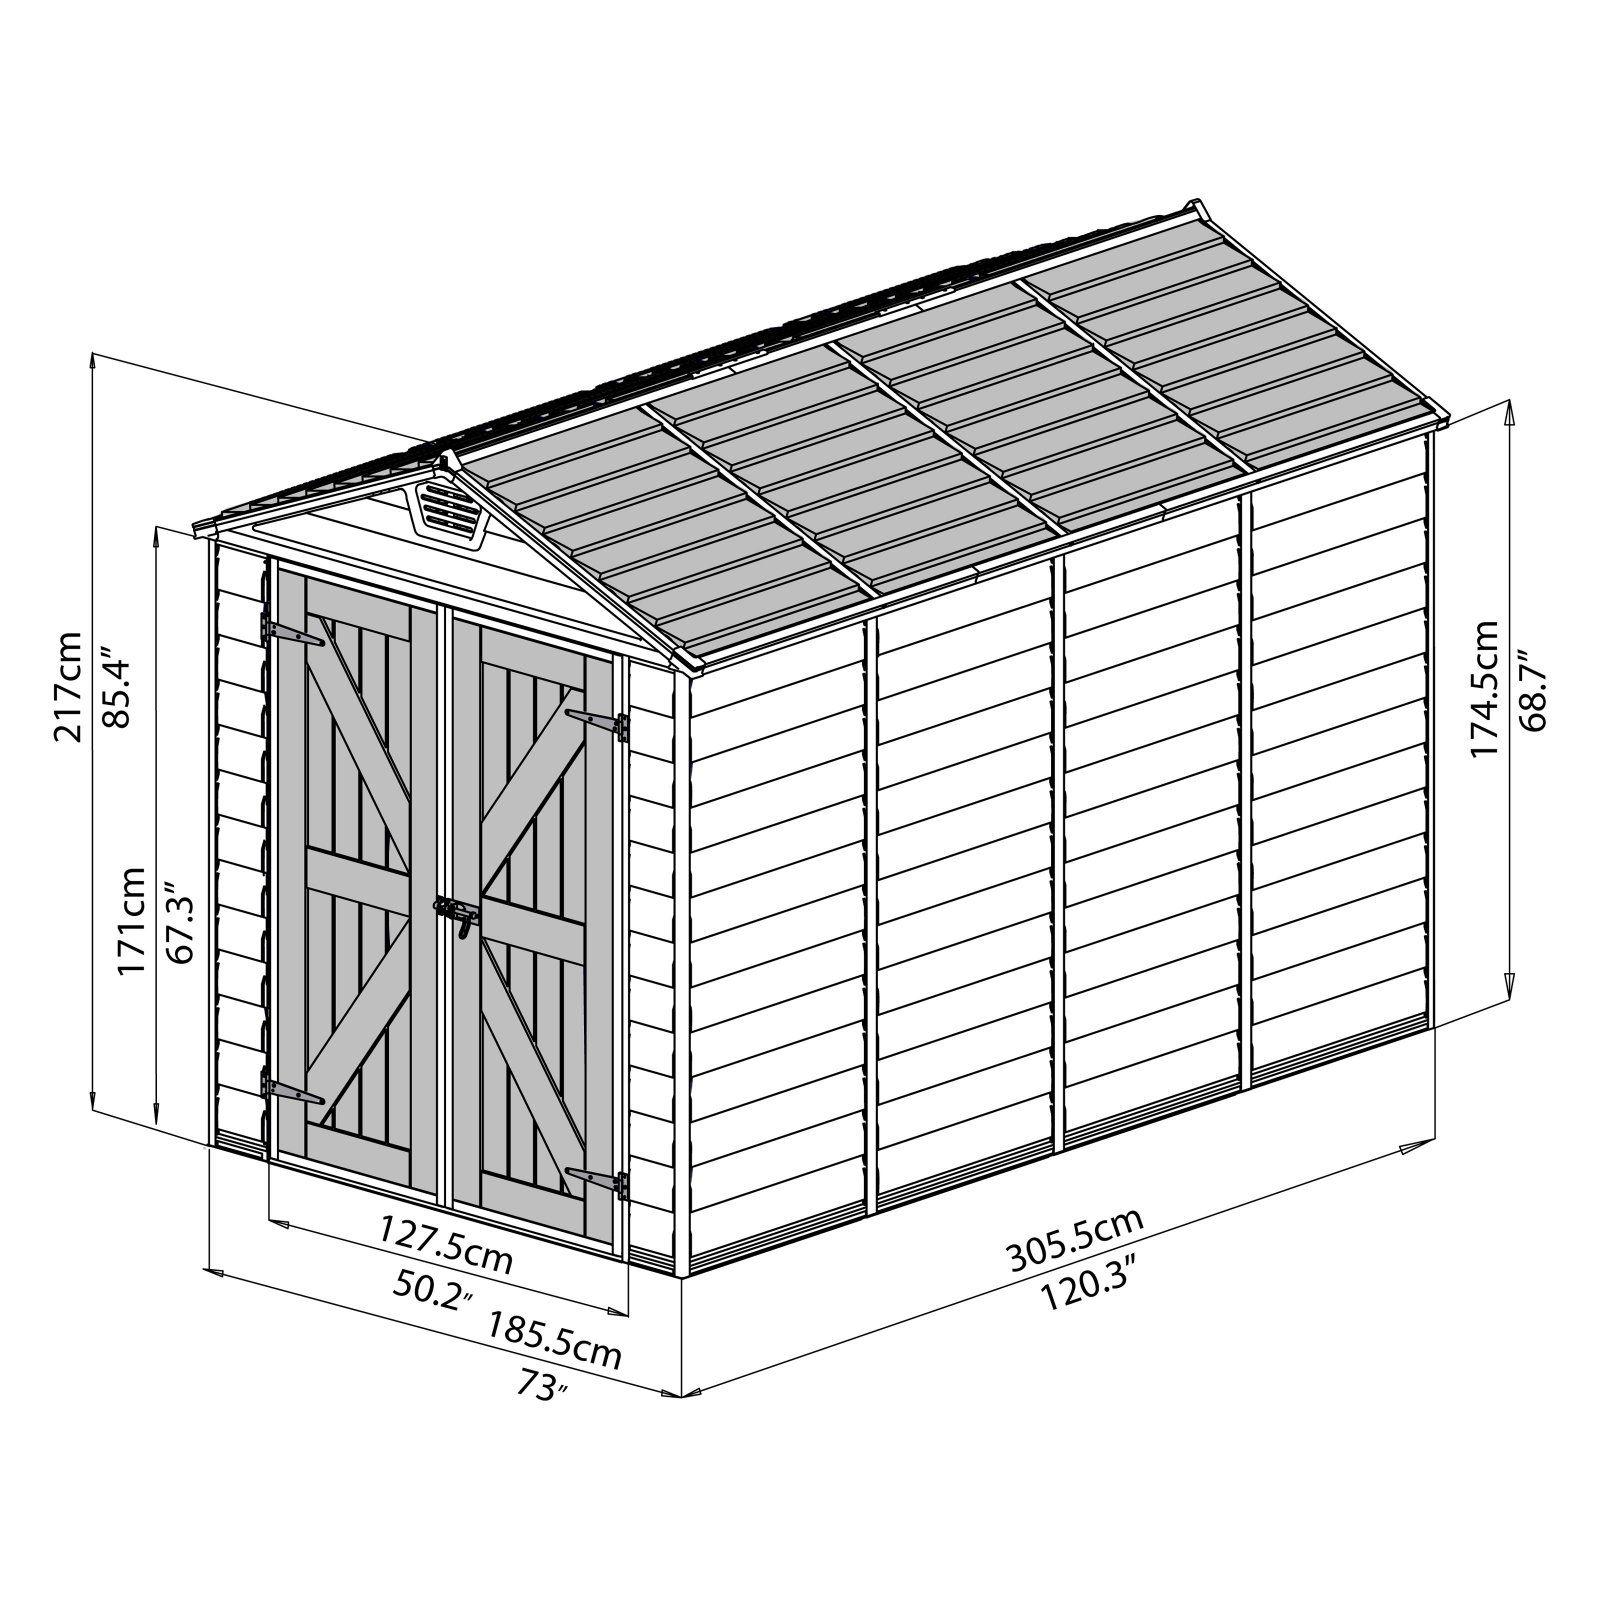 Palram Skylight Storage Shed